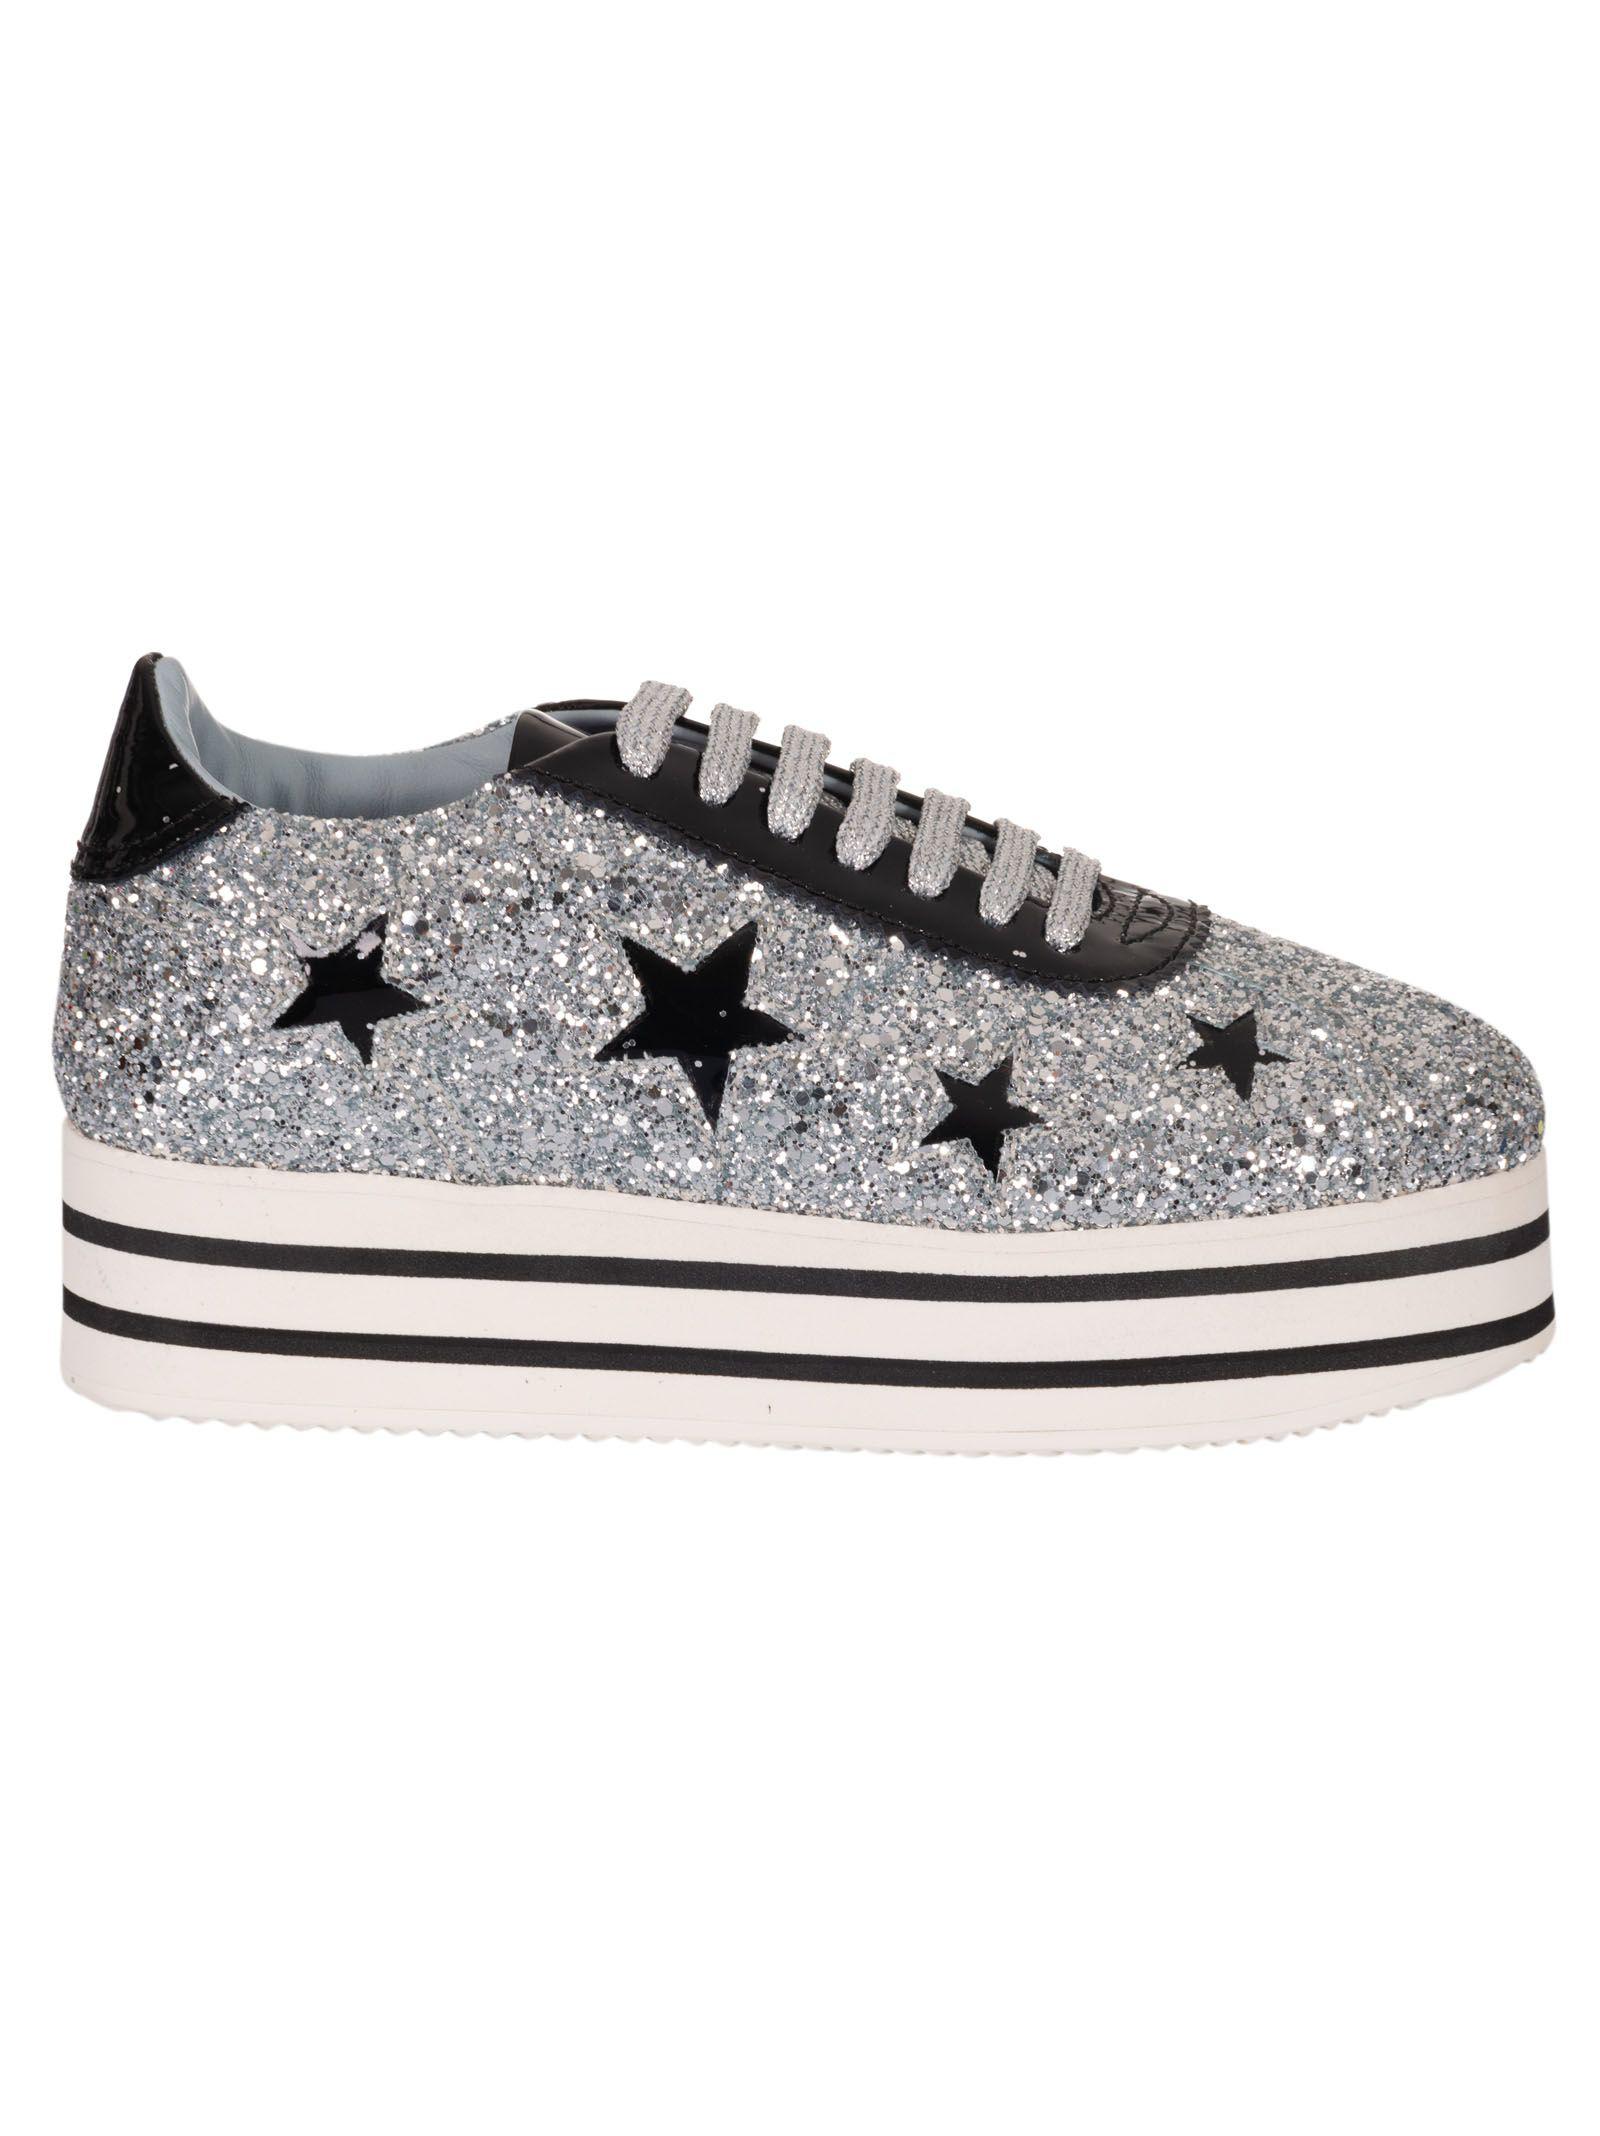 5c3b6a0b22e594 Chiara Ferragni Suite Platform Sneakers With Stars In Metallic ...